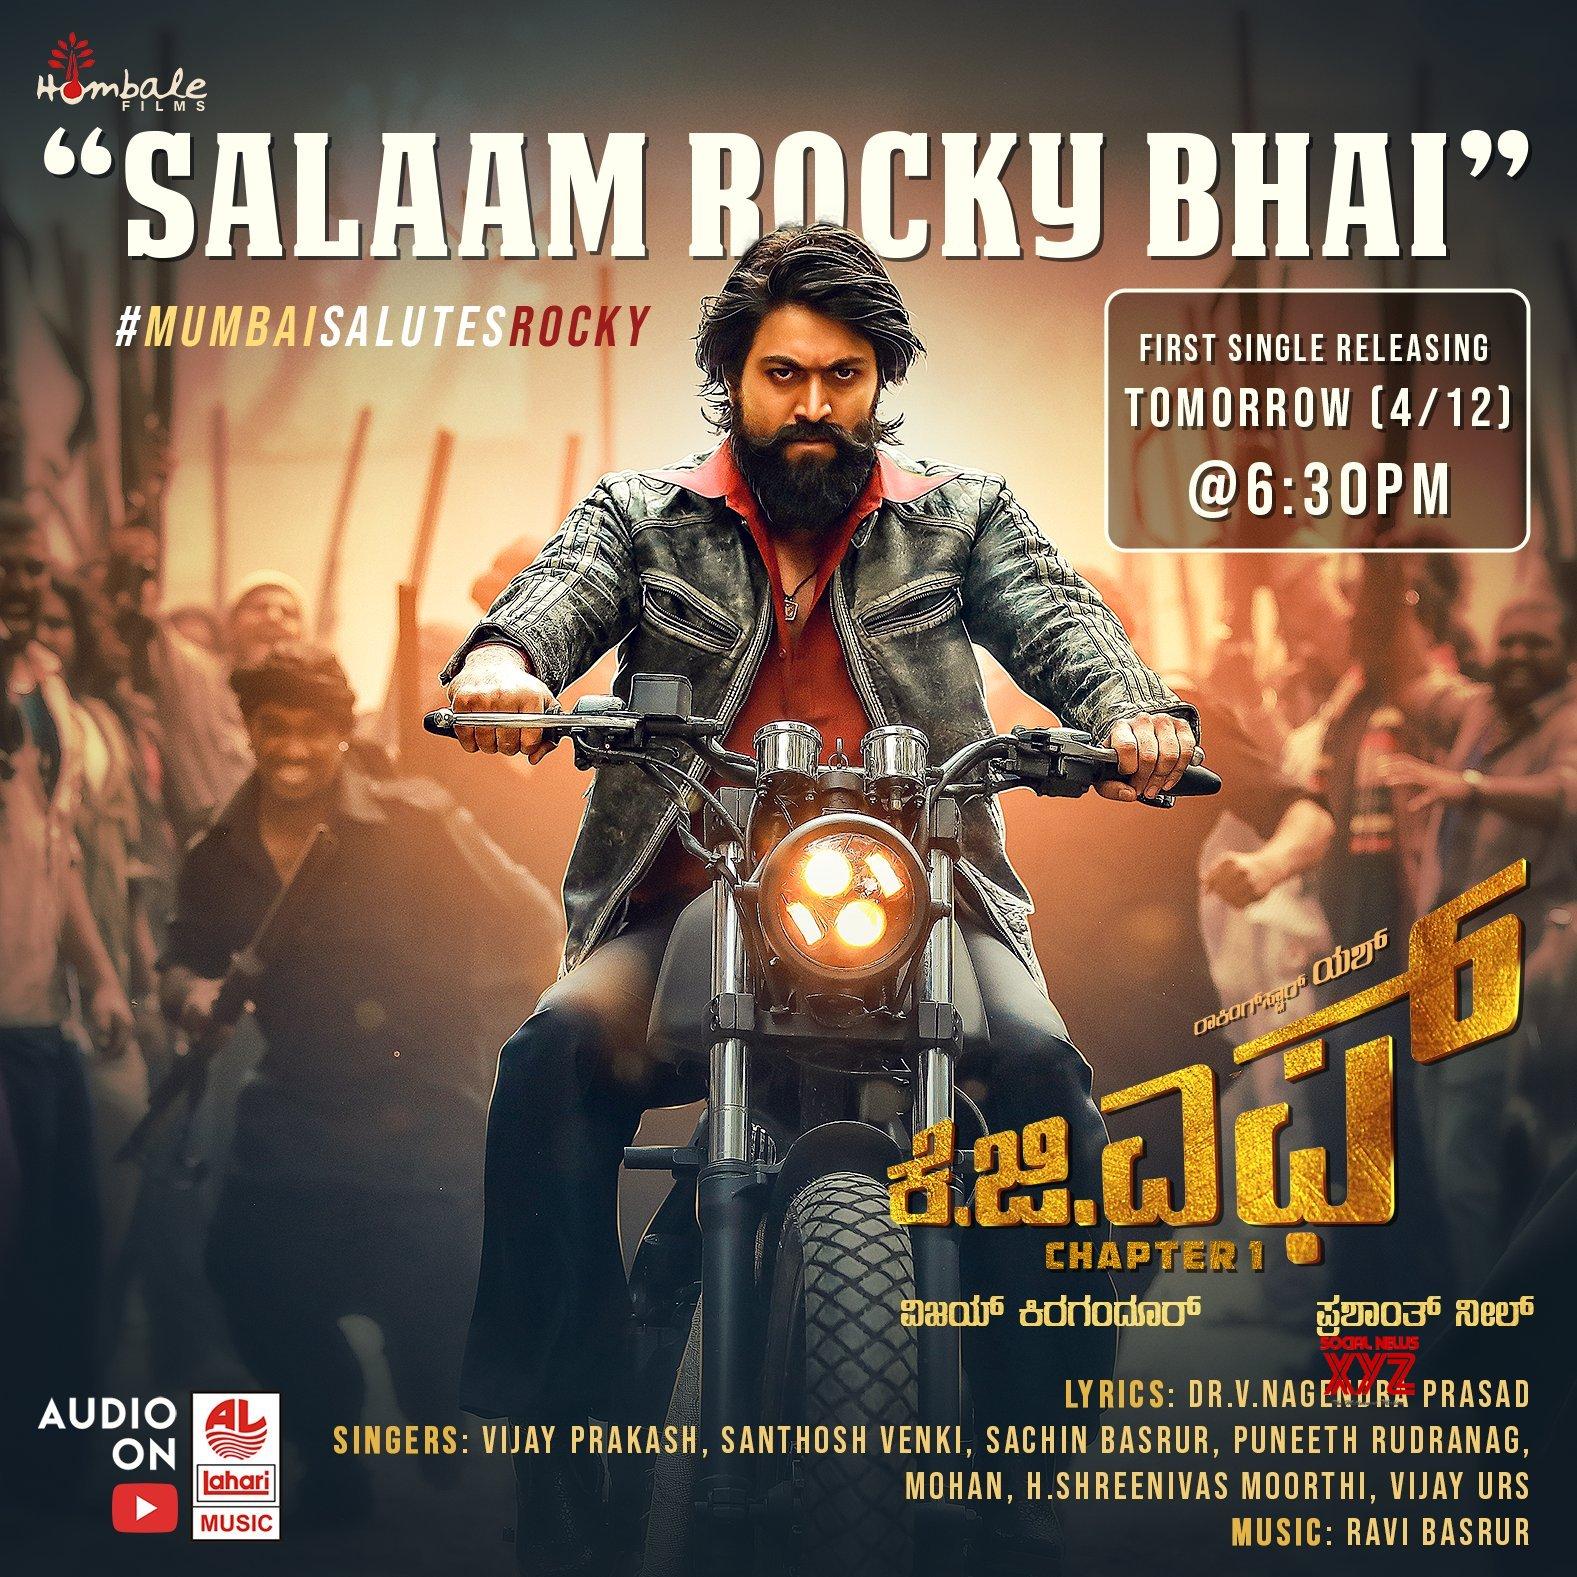 Kgf Movie First Single Salaam Rocky Bhai Releasing Tomorrow At 6 30